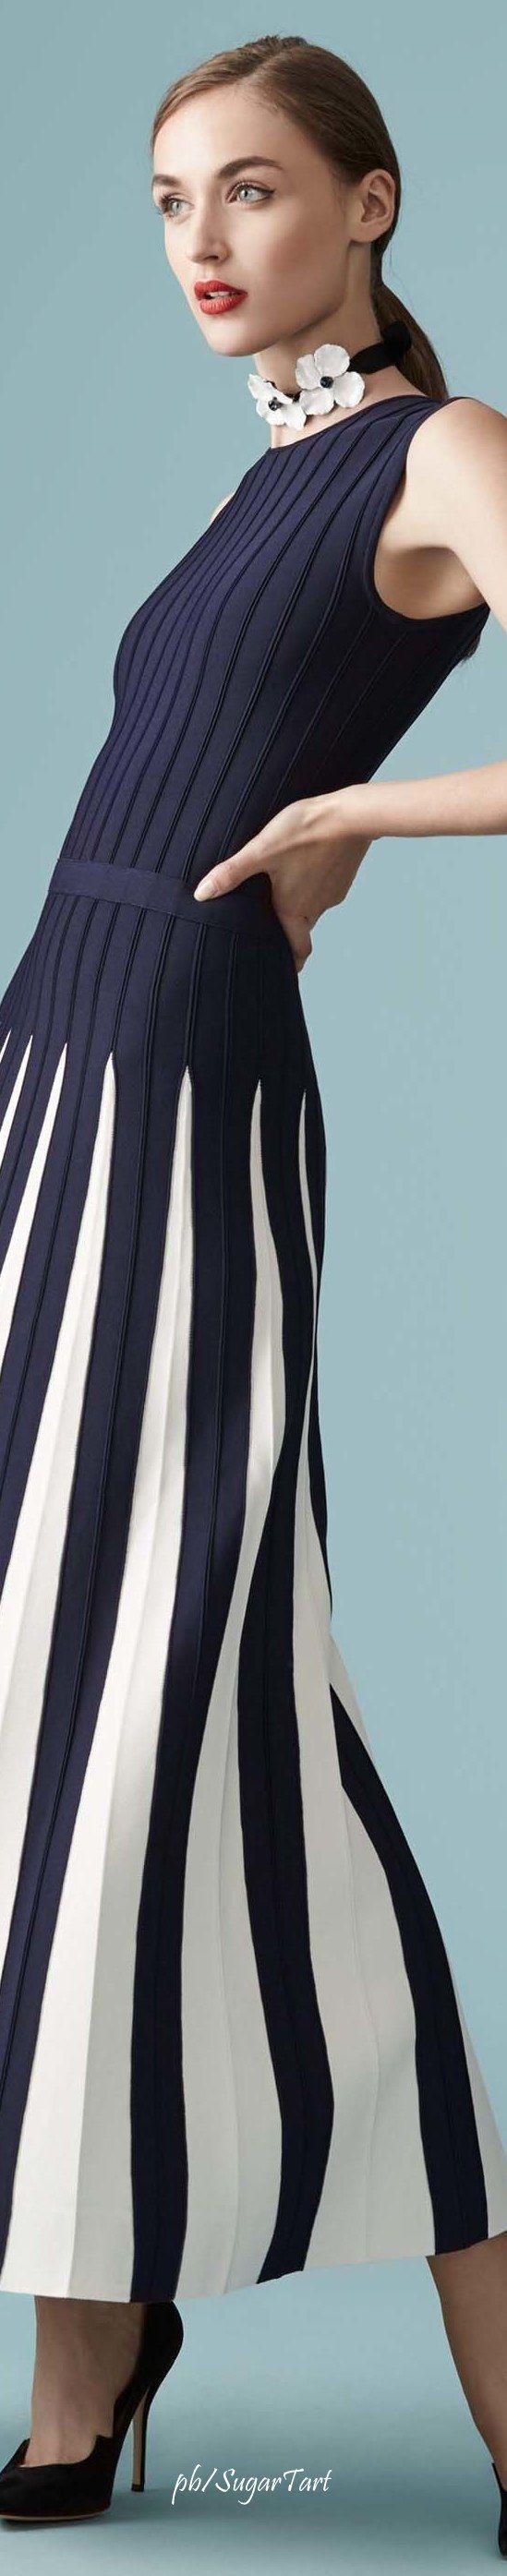 Carolina Herrera Resort 2017 Clothing, Shoes & Jewelry : Women http://amzn.to/2kCgwsM